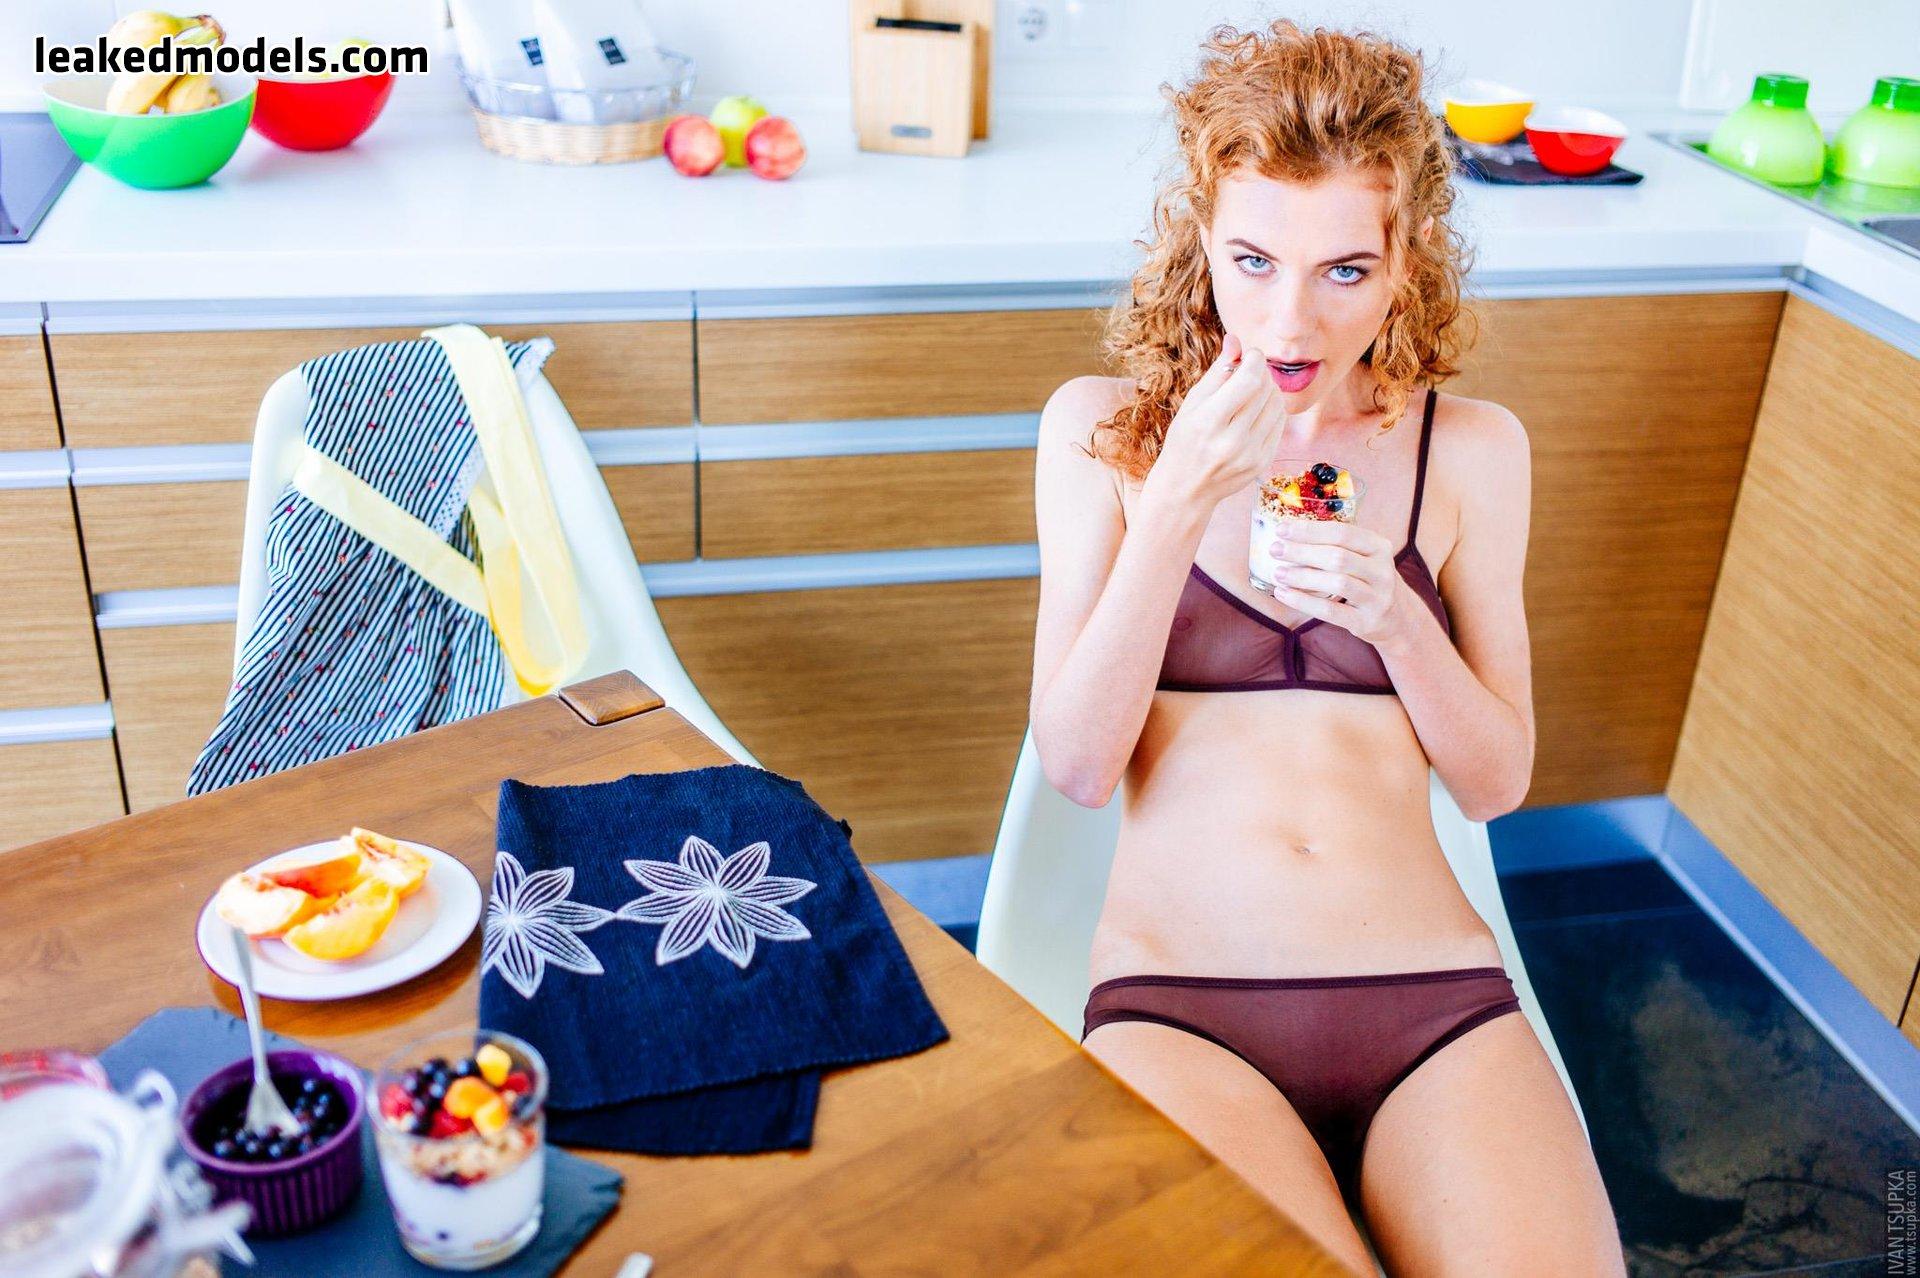 Anya Laricheva Instagram Nude Leaks (30 Photos)